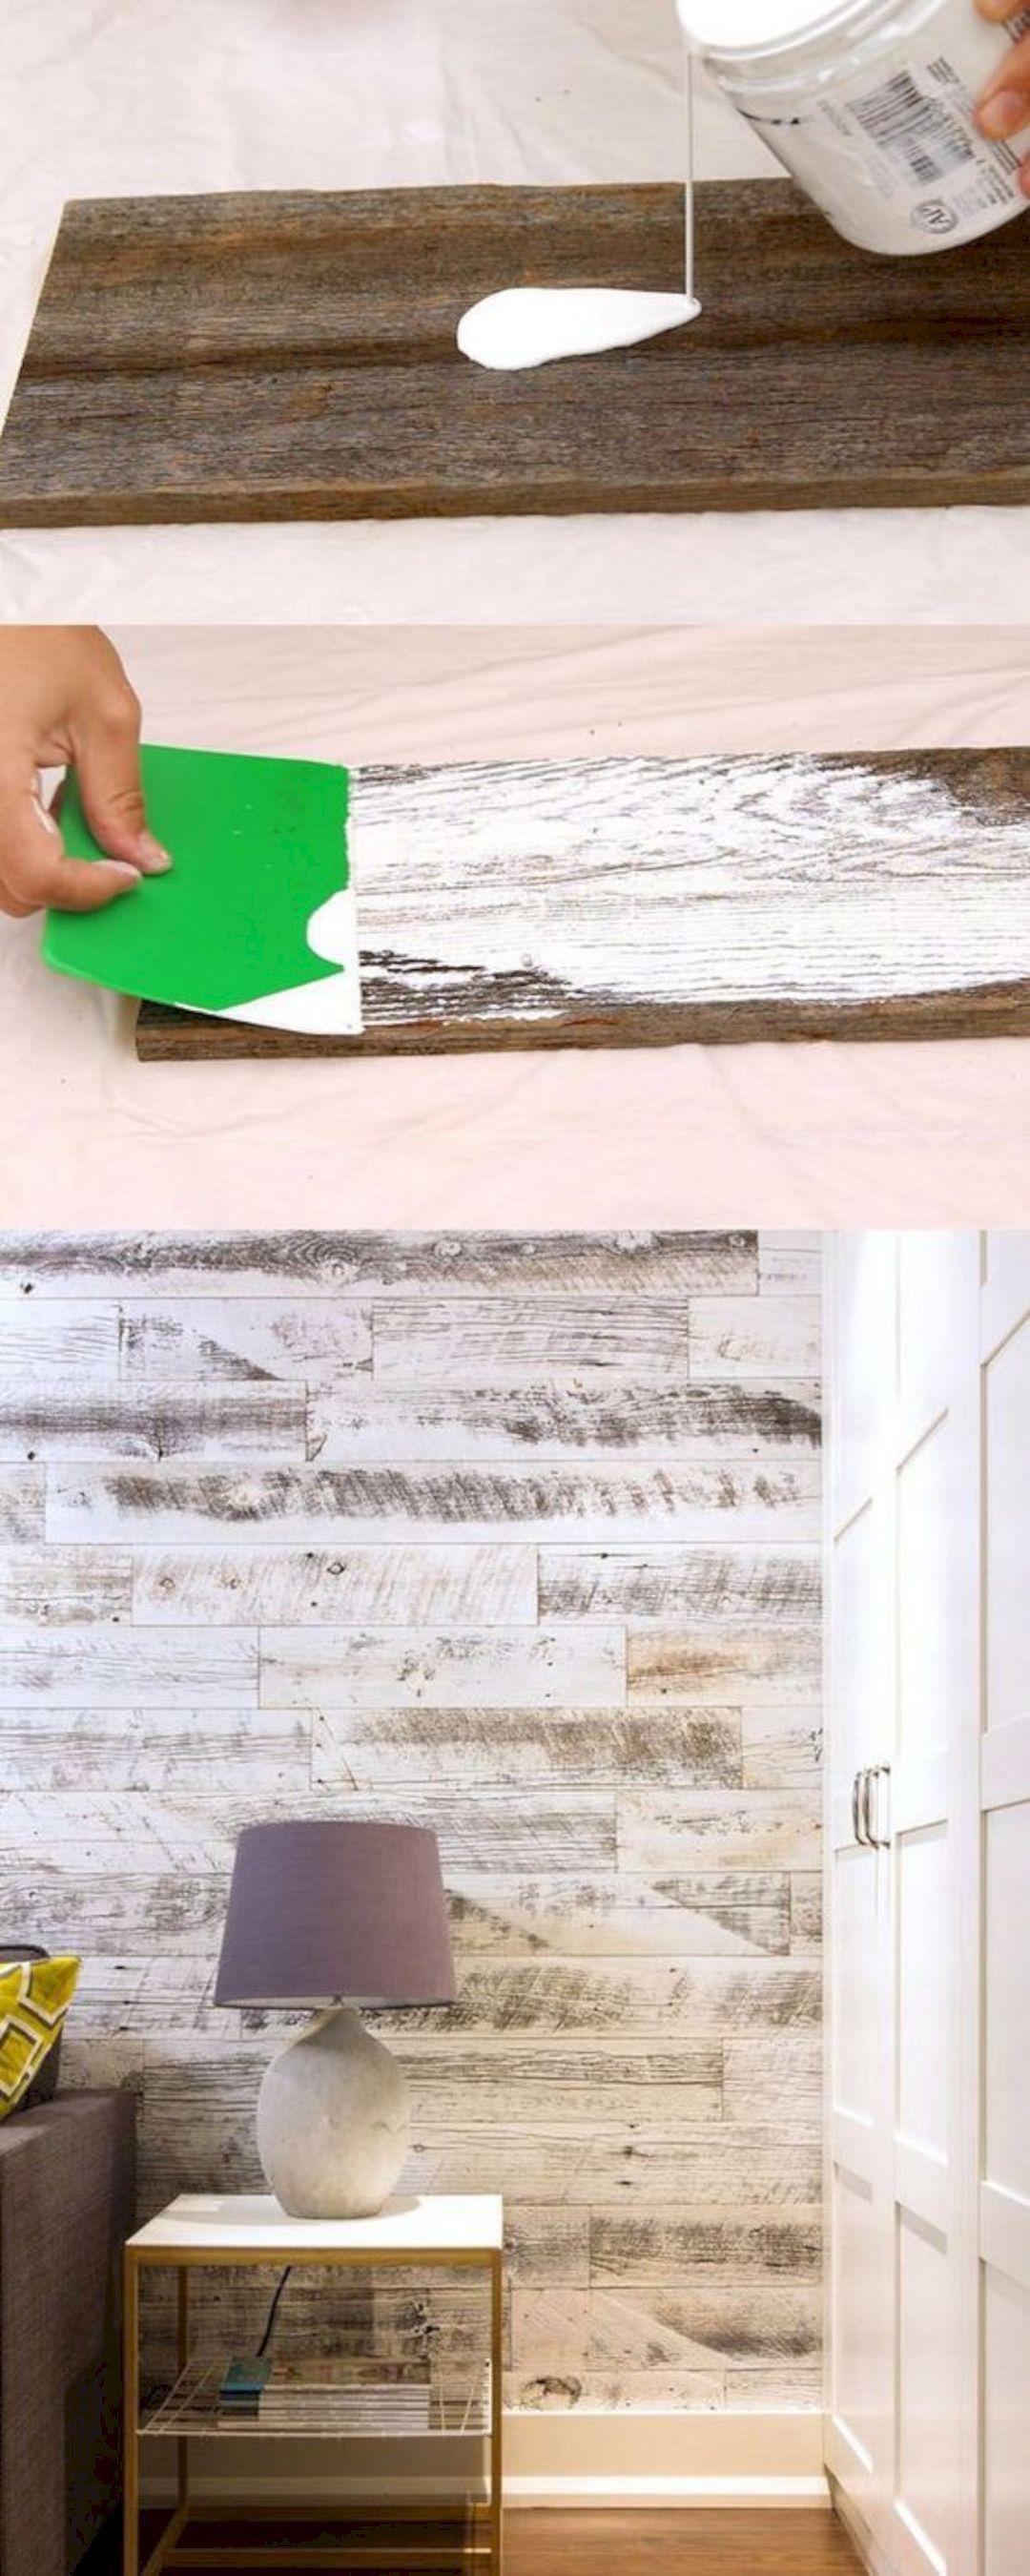 Schön 15 Refinishing Ideas To Revamp Your Furniture |